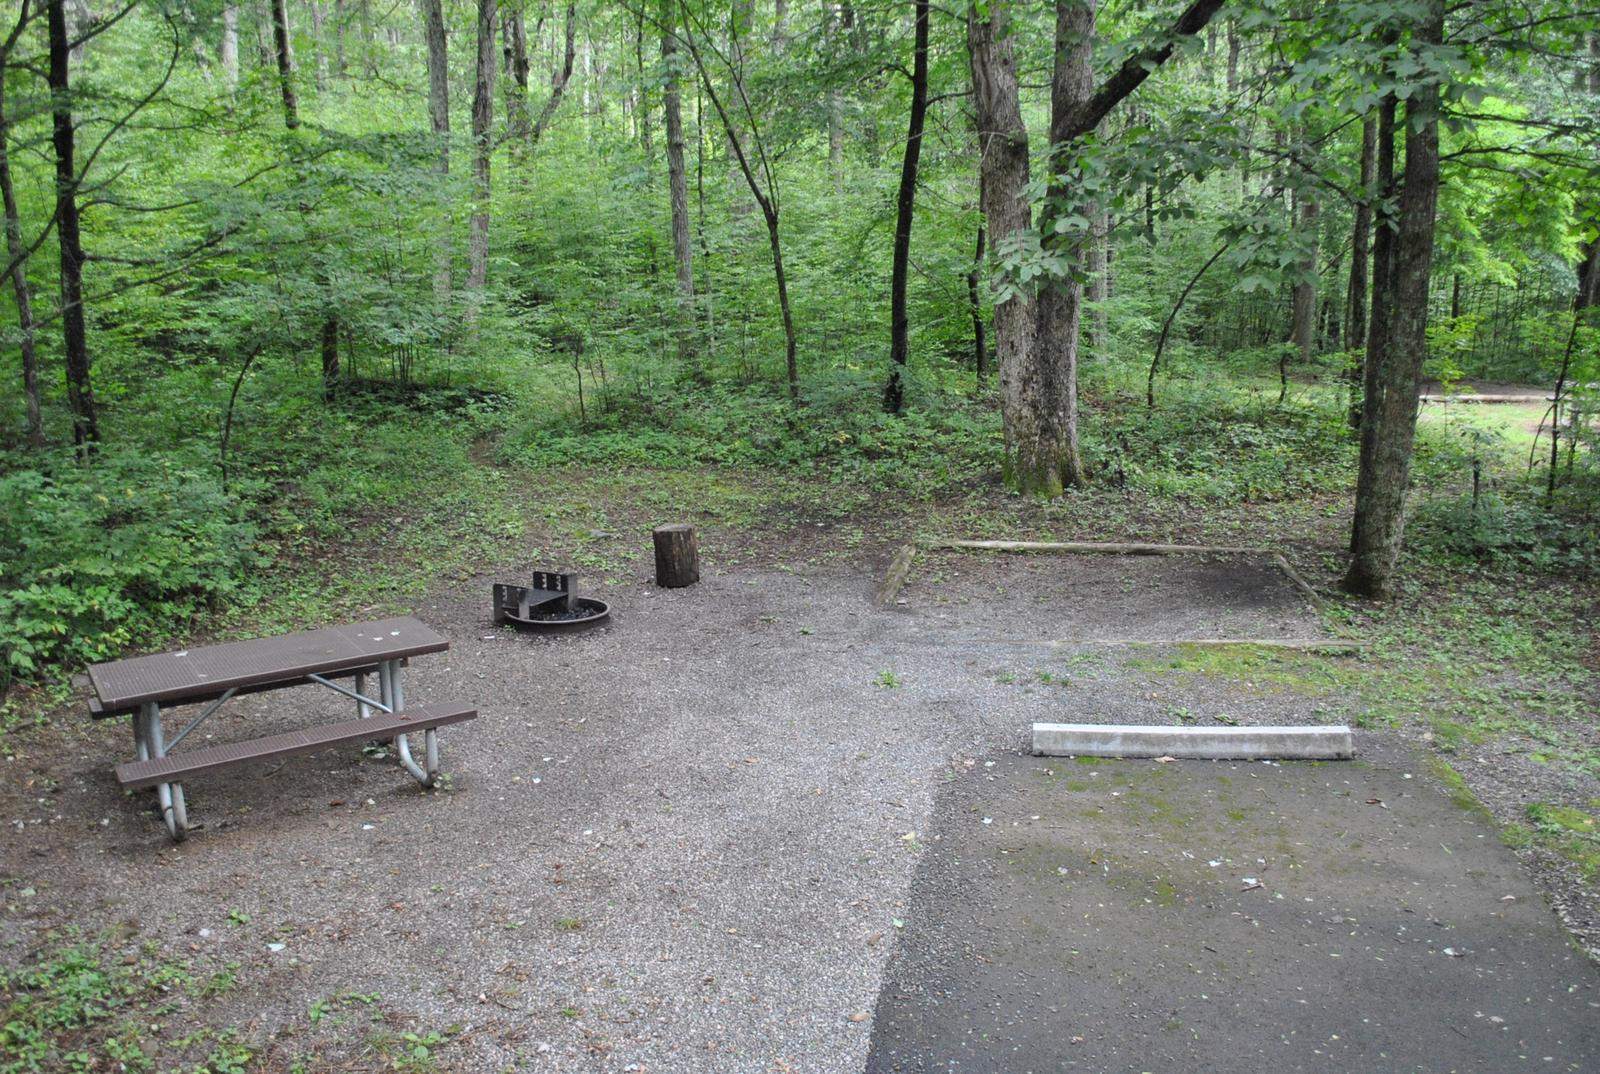 Mathews Arm Campground – Site A017